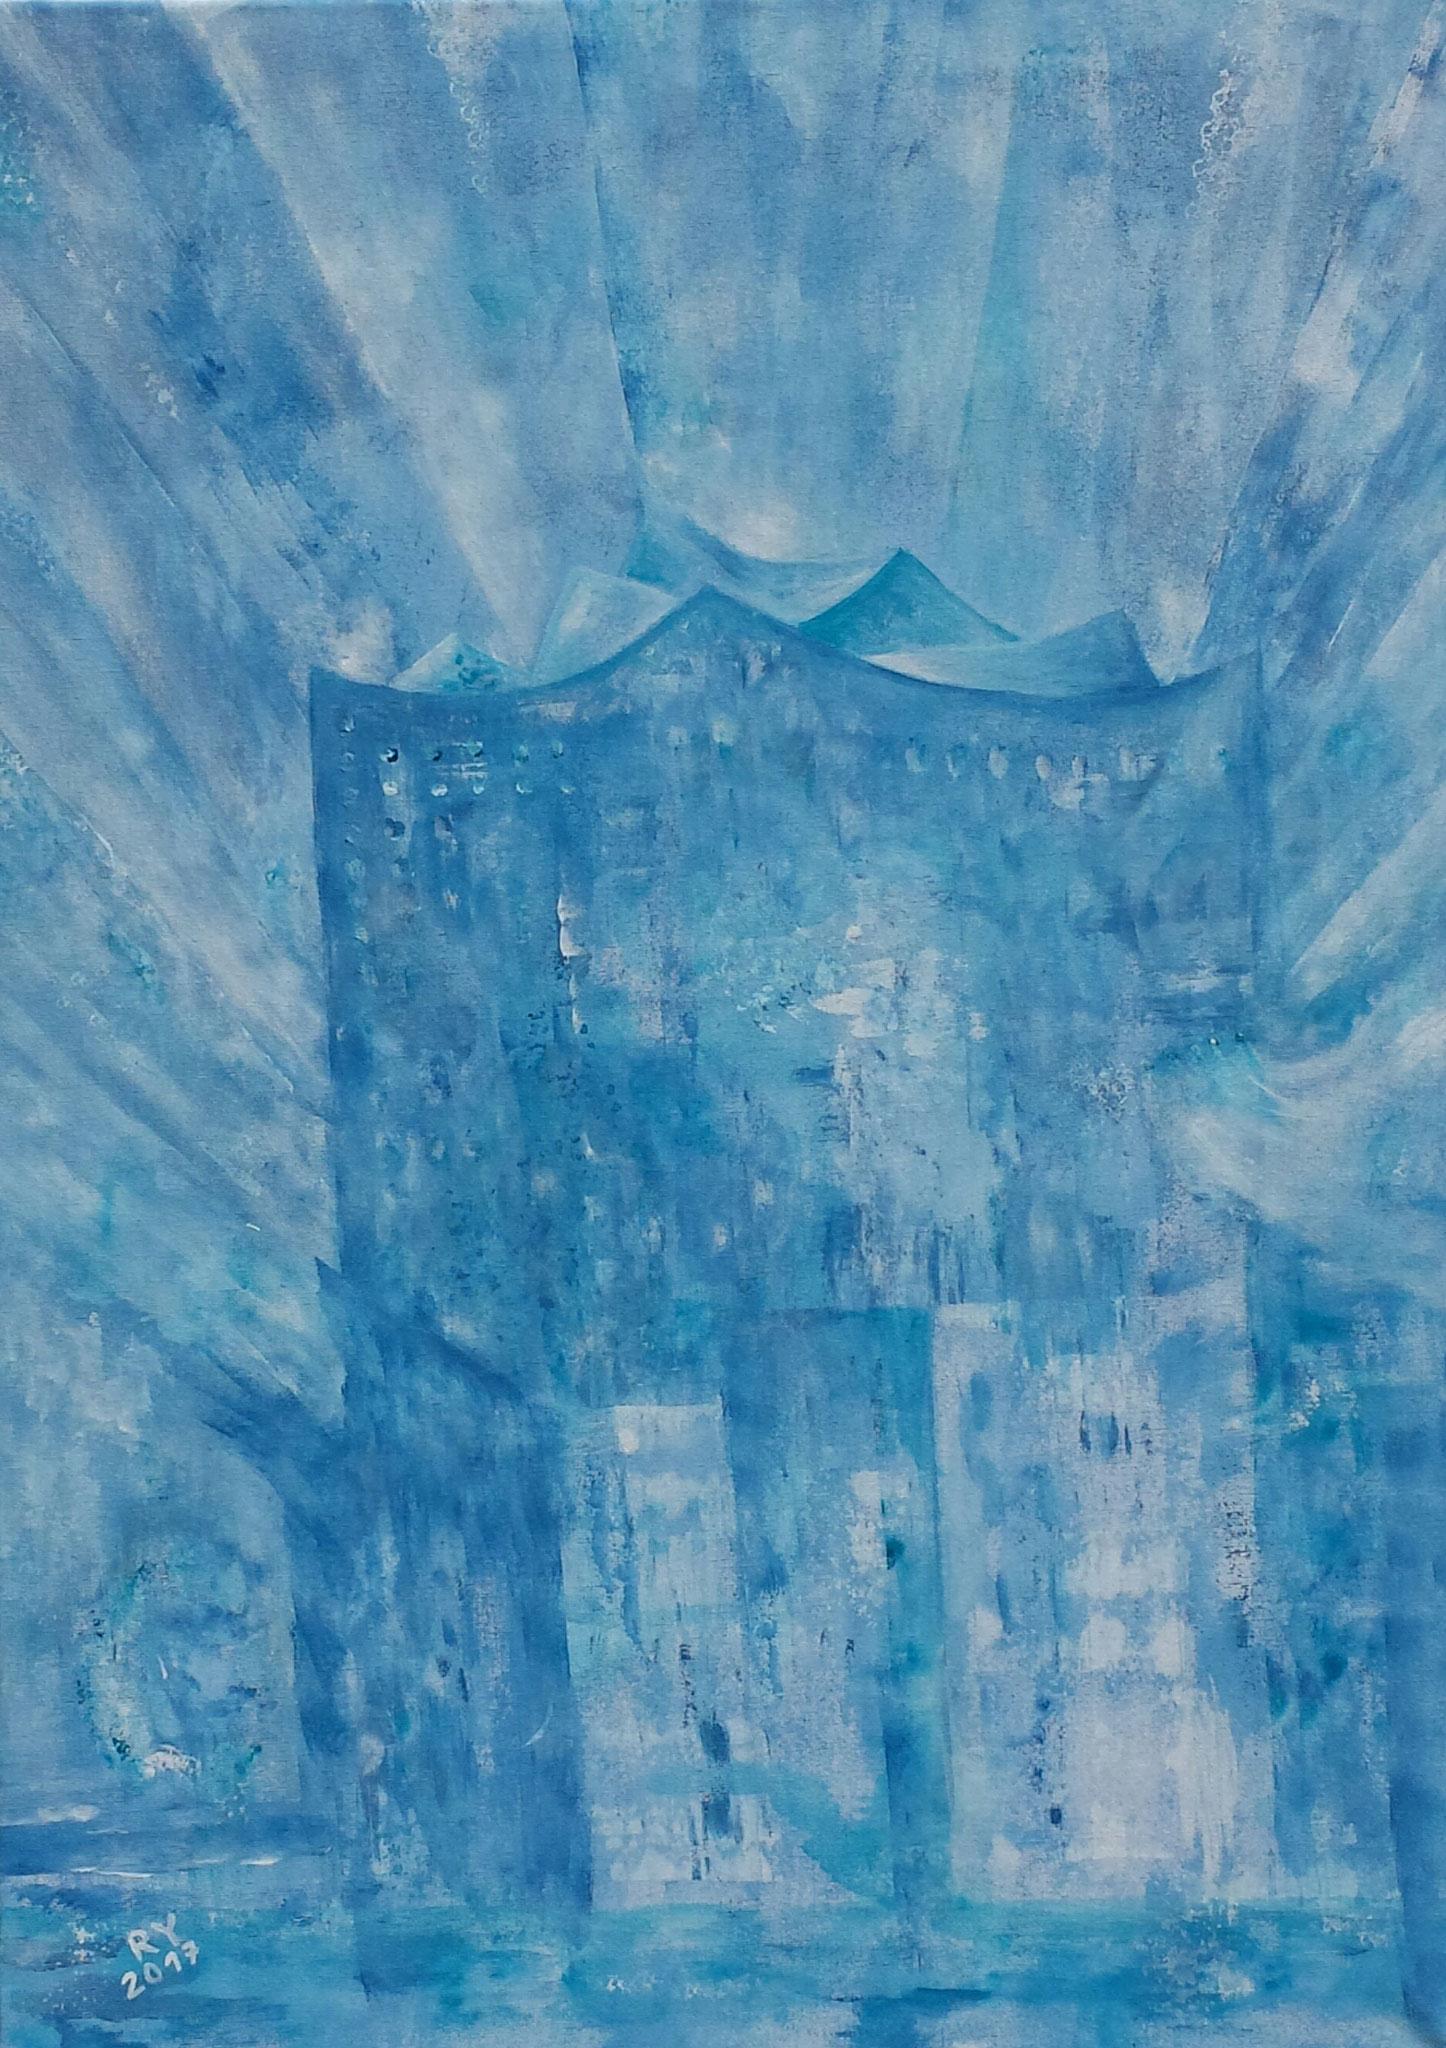 blaue Elbphilharmonie, 50x70, Acryl auf Leinwand